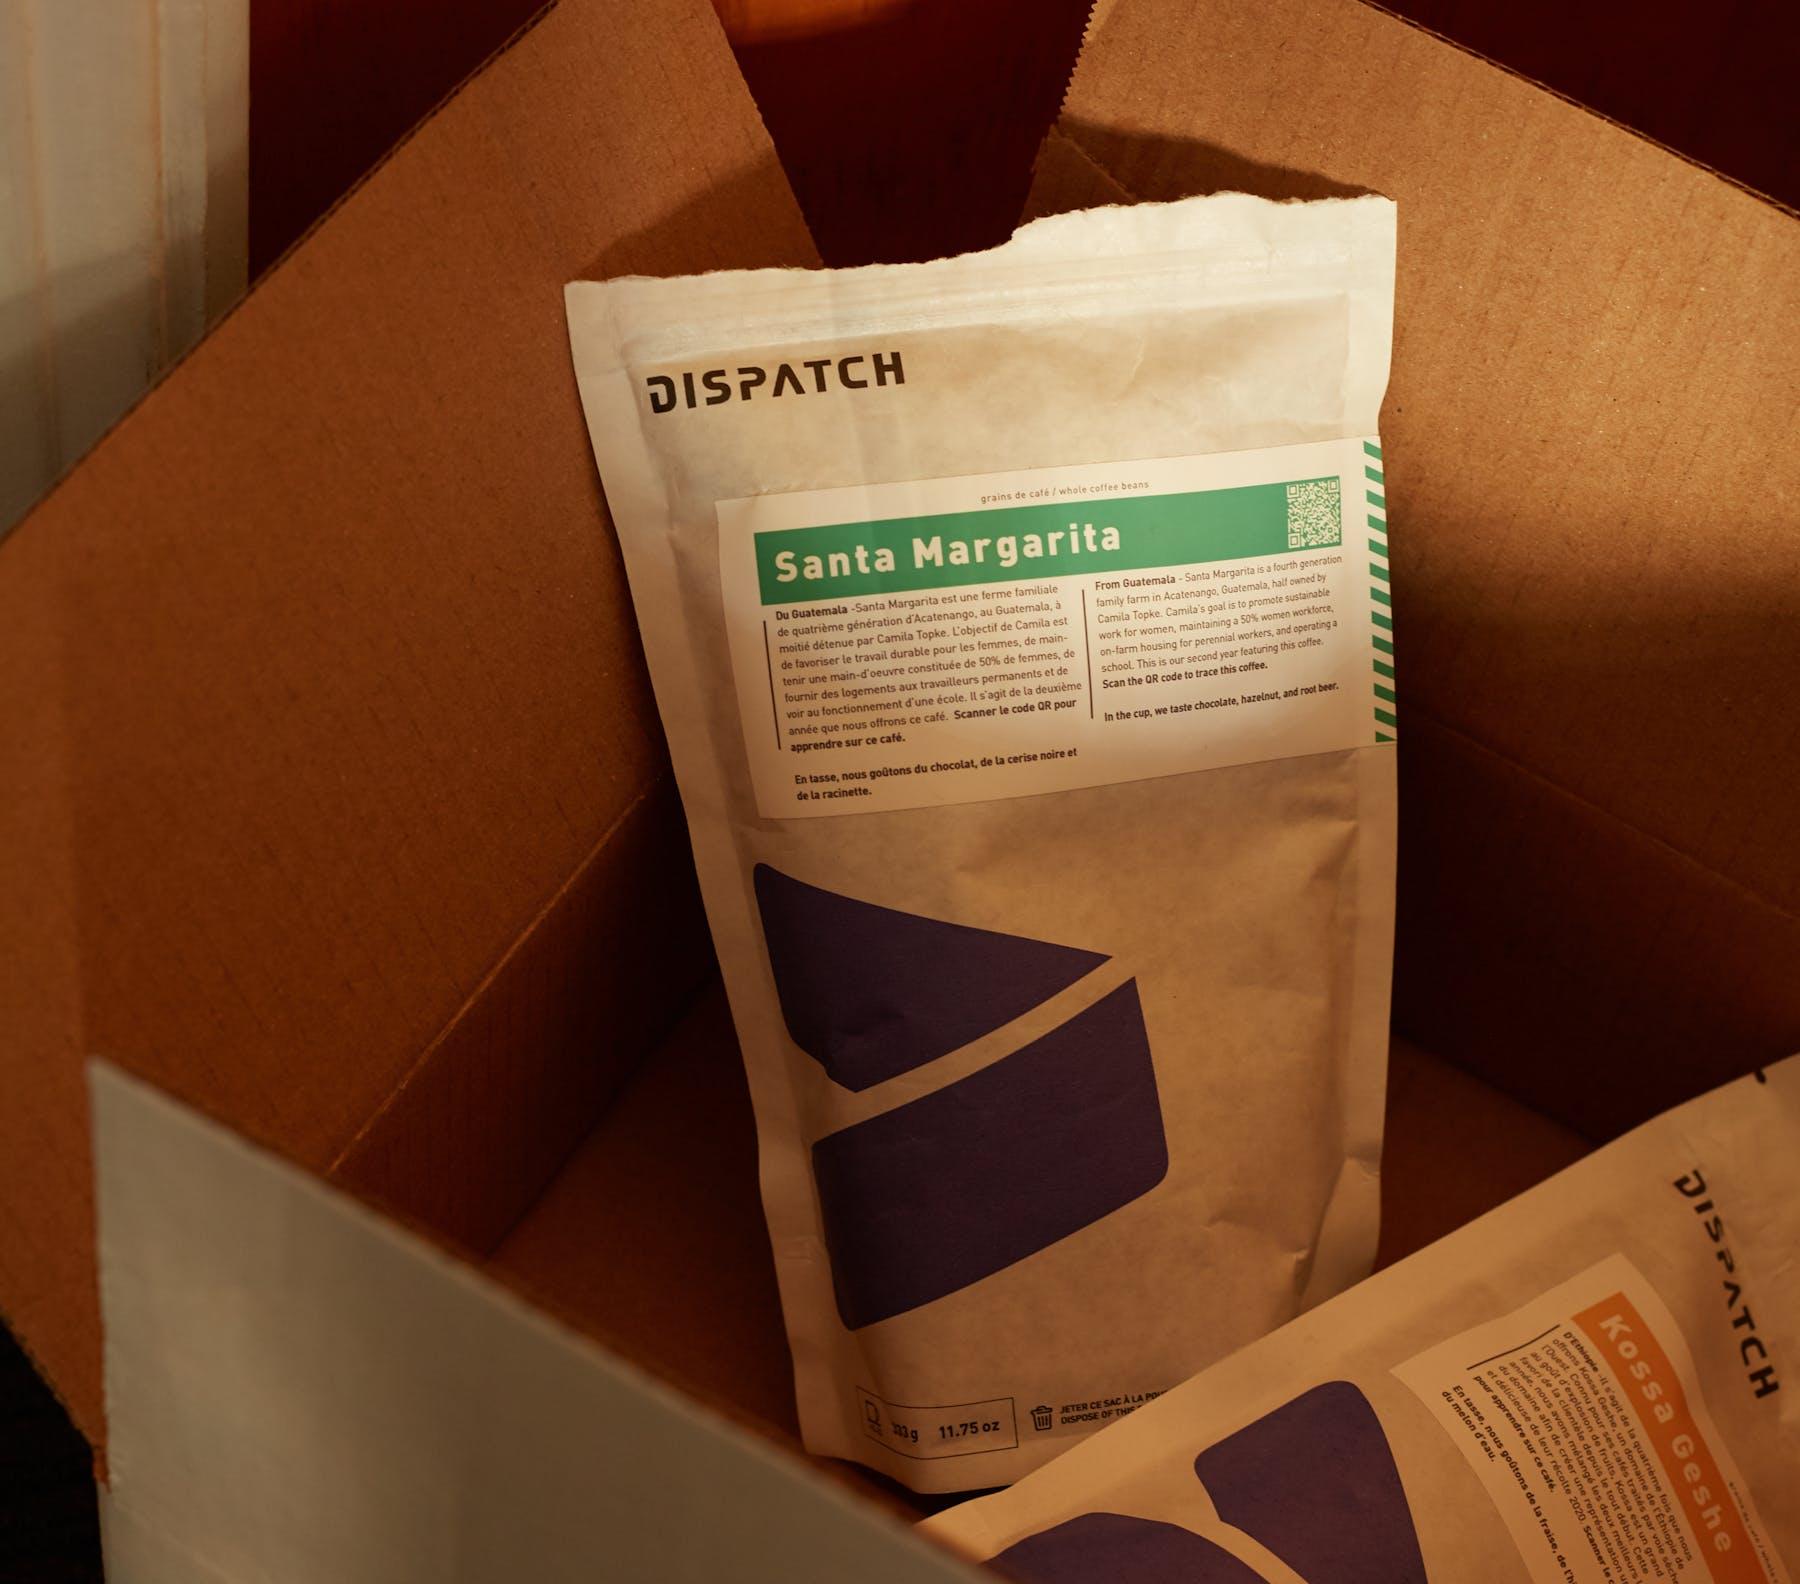 Dispatch 01